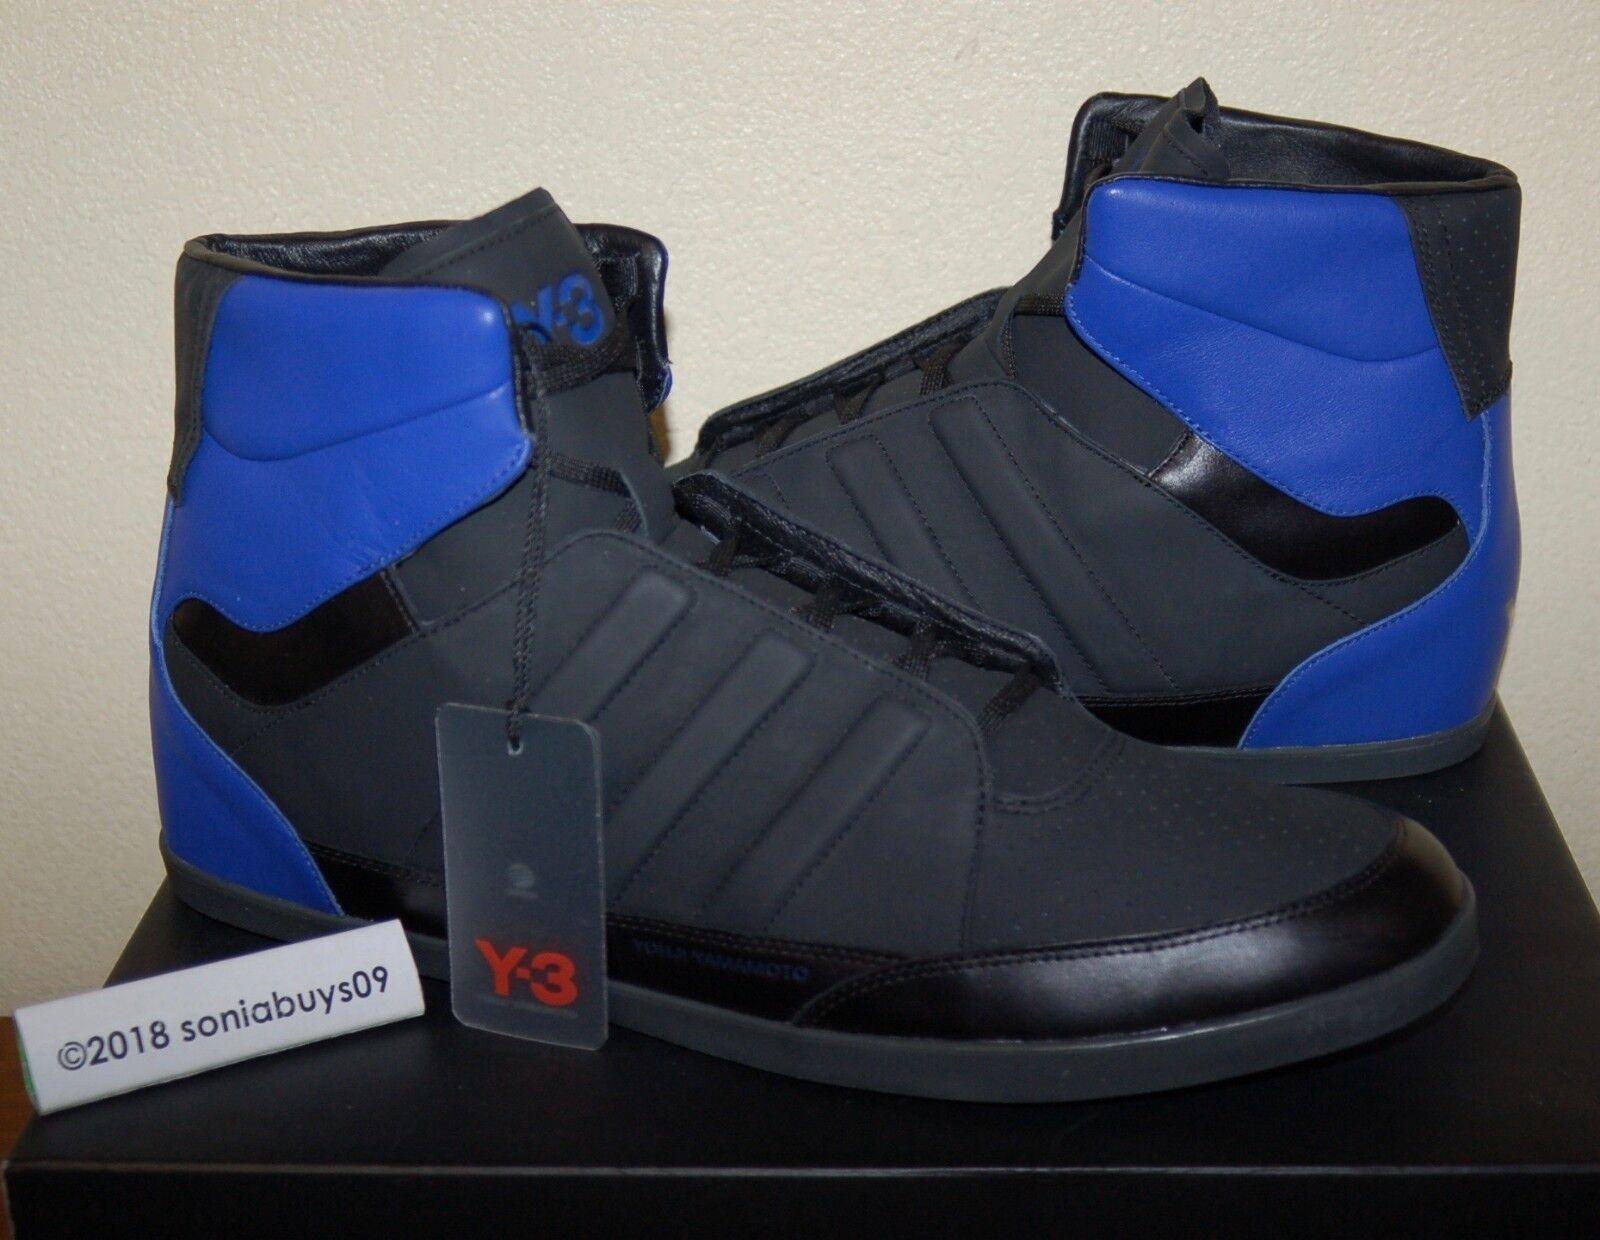 Adidas uomini oe honja alto scarpe, 14 v22247, nero / blu, taglia 14 scarpe, 5abeb3